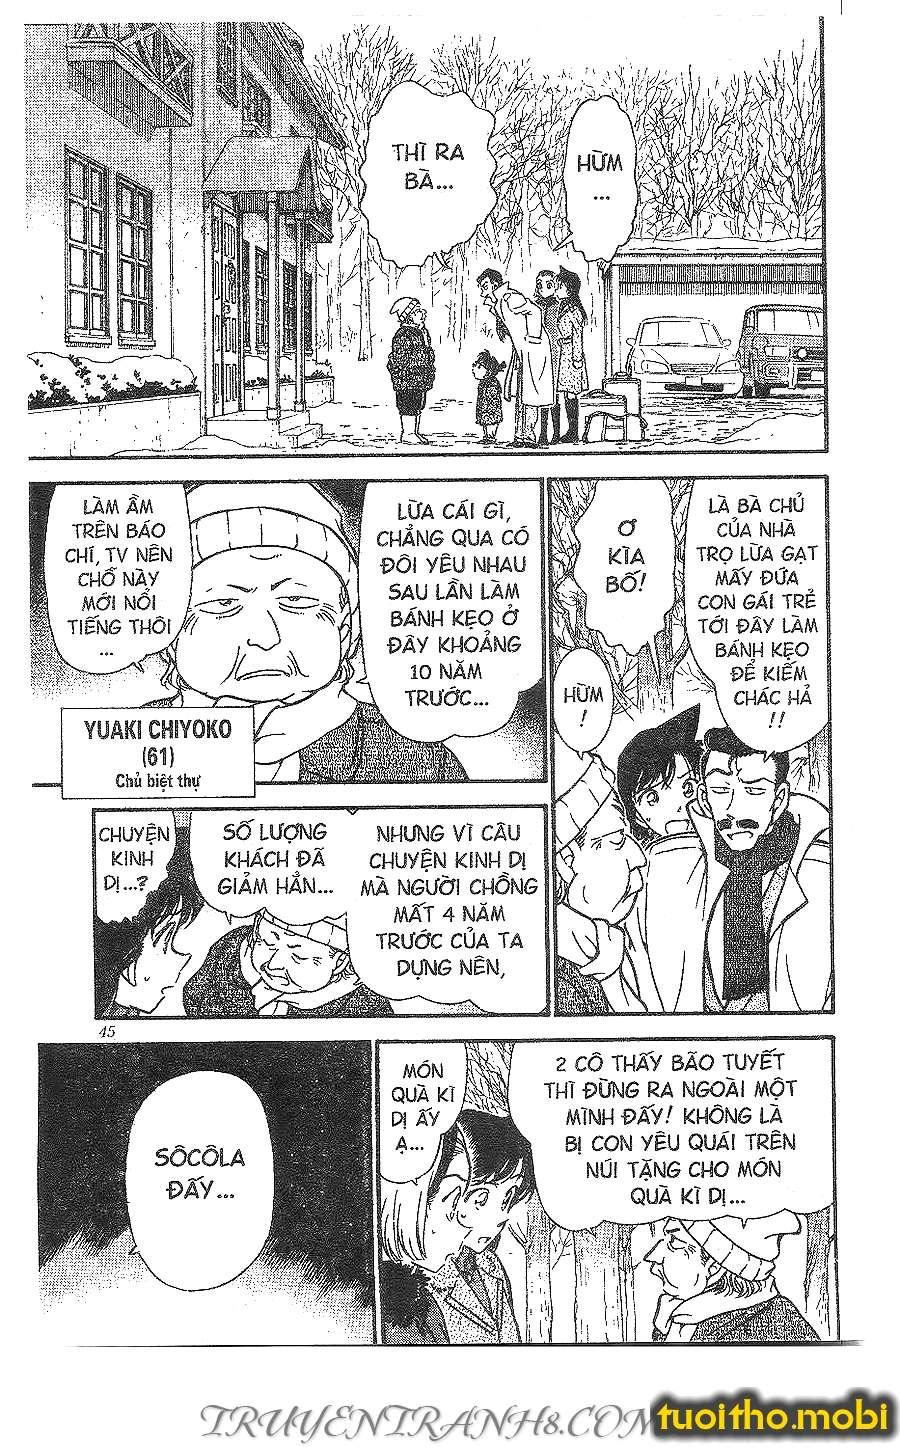 conan chương 331 trang 8